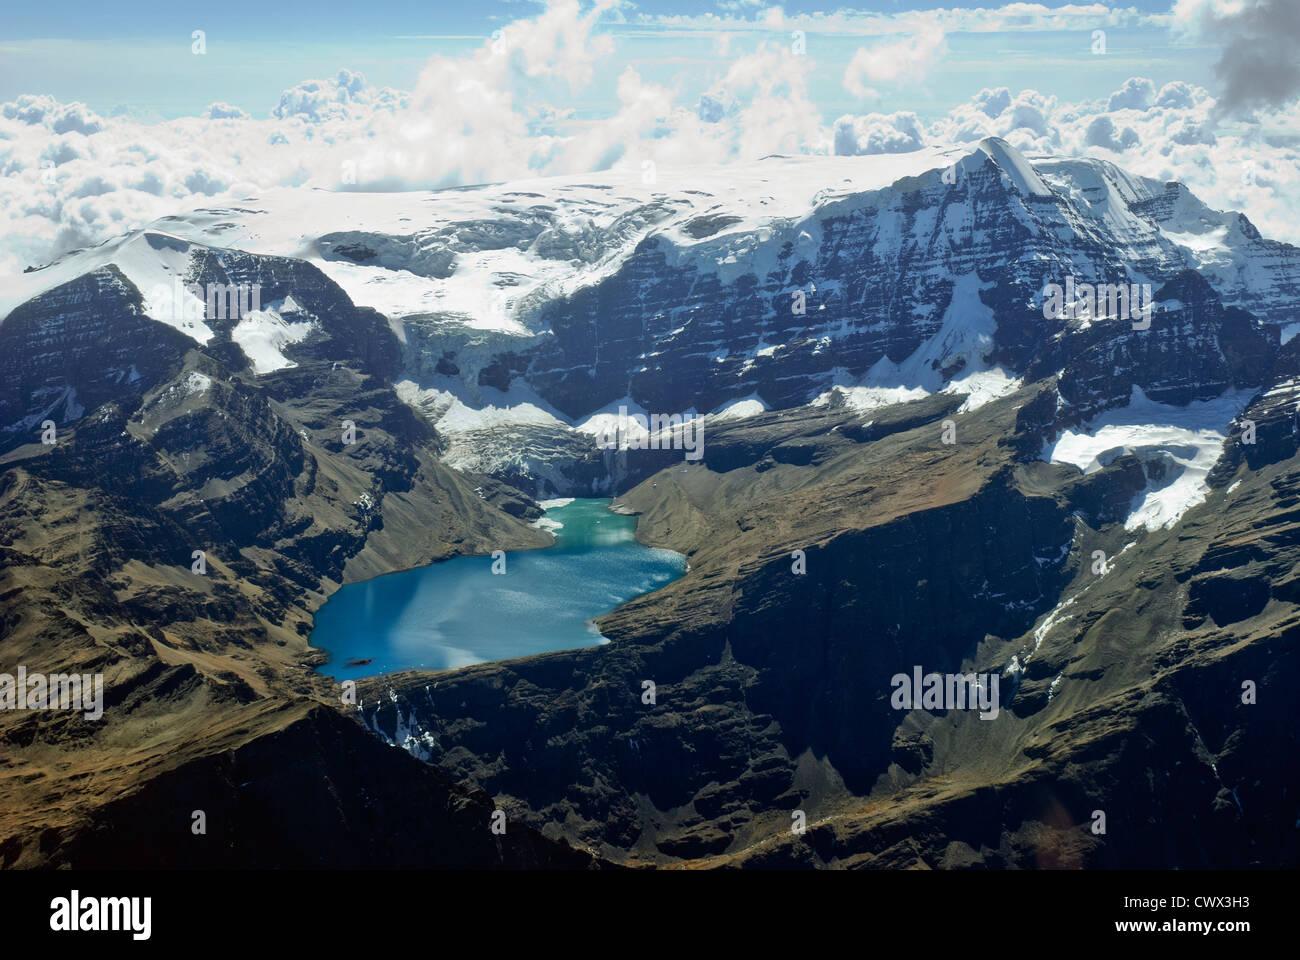 Aerial view of the mountain Mururata, Cordillera of the Andes Stock Photo